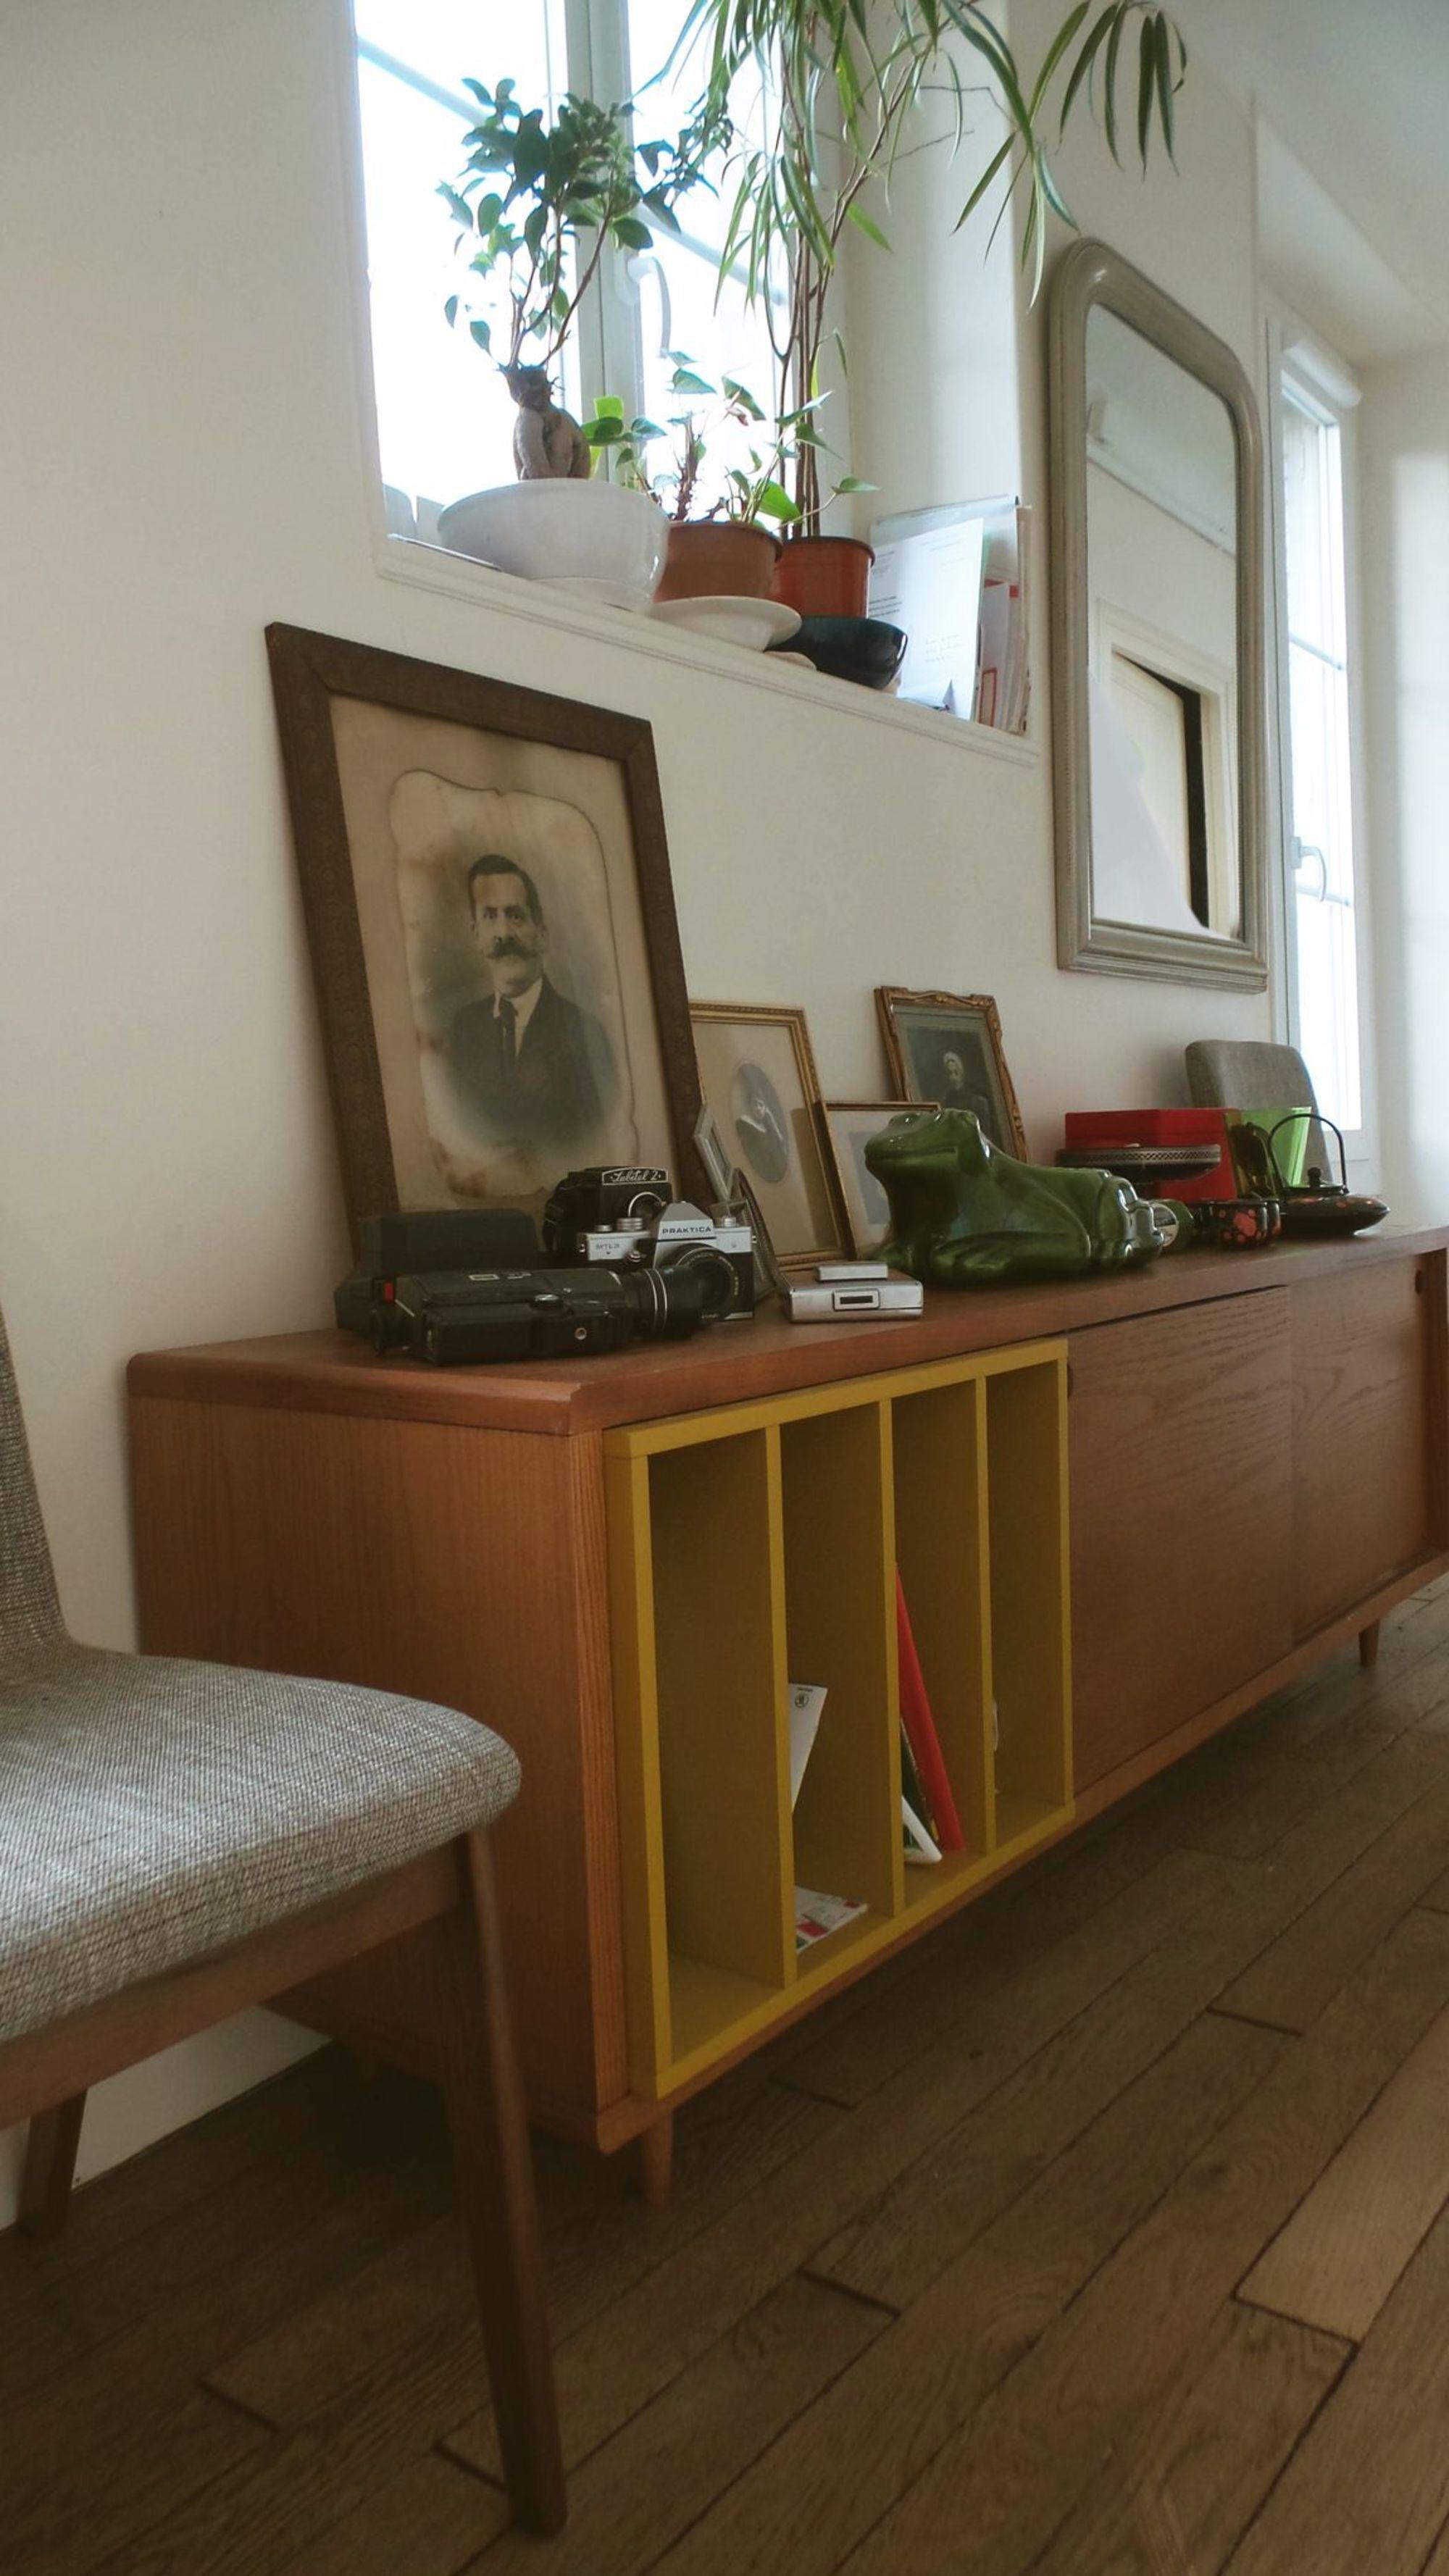 Karine Martin : où vit l'architecte de La Maison France 5 ? | Maison france 5, Maison et France 5